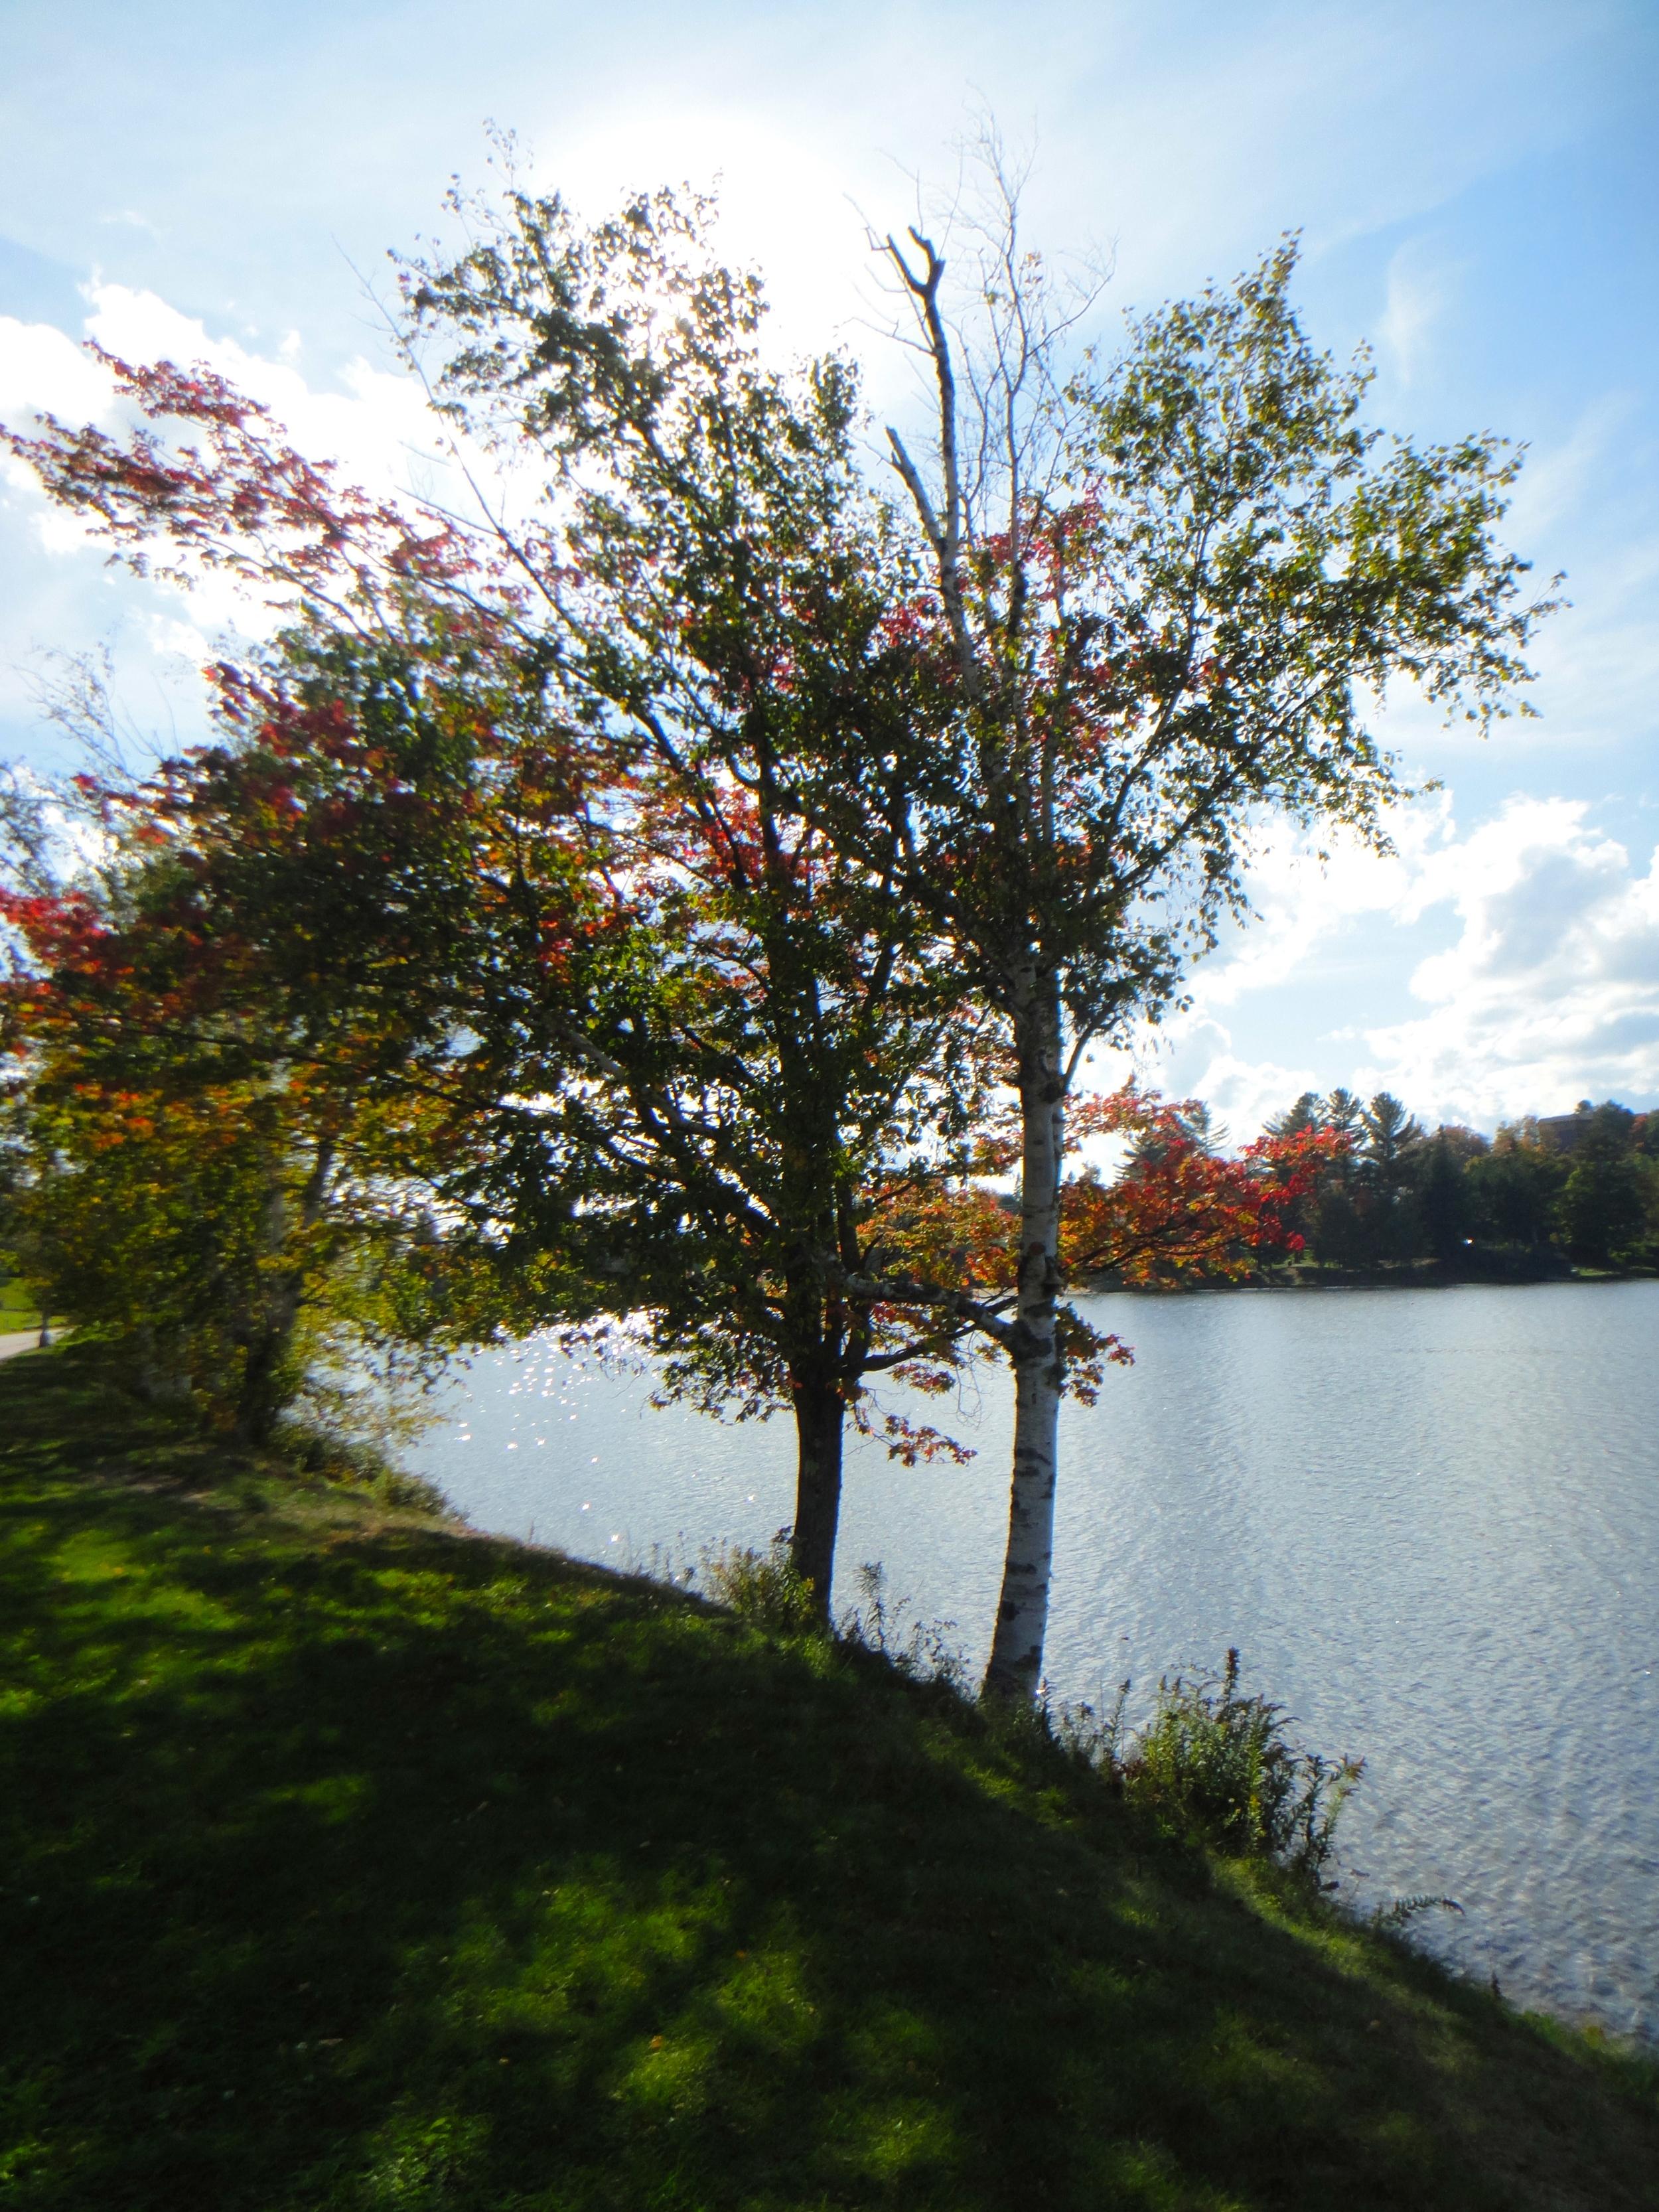 Mirror Lake fall foliage and colors